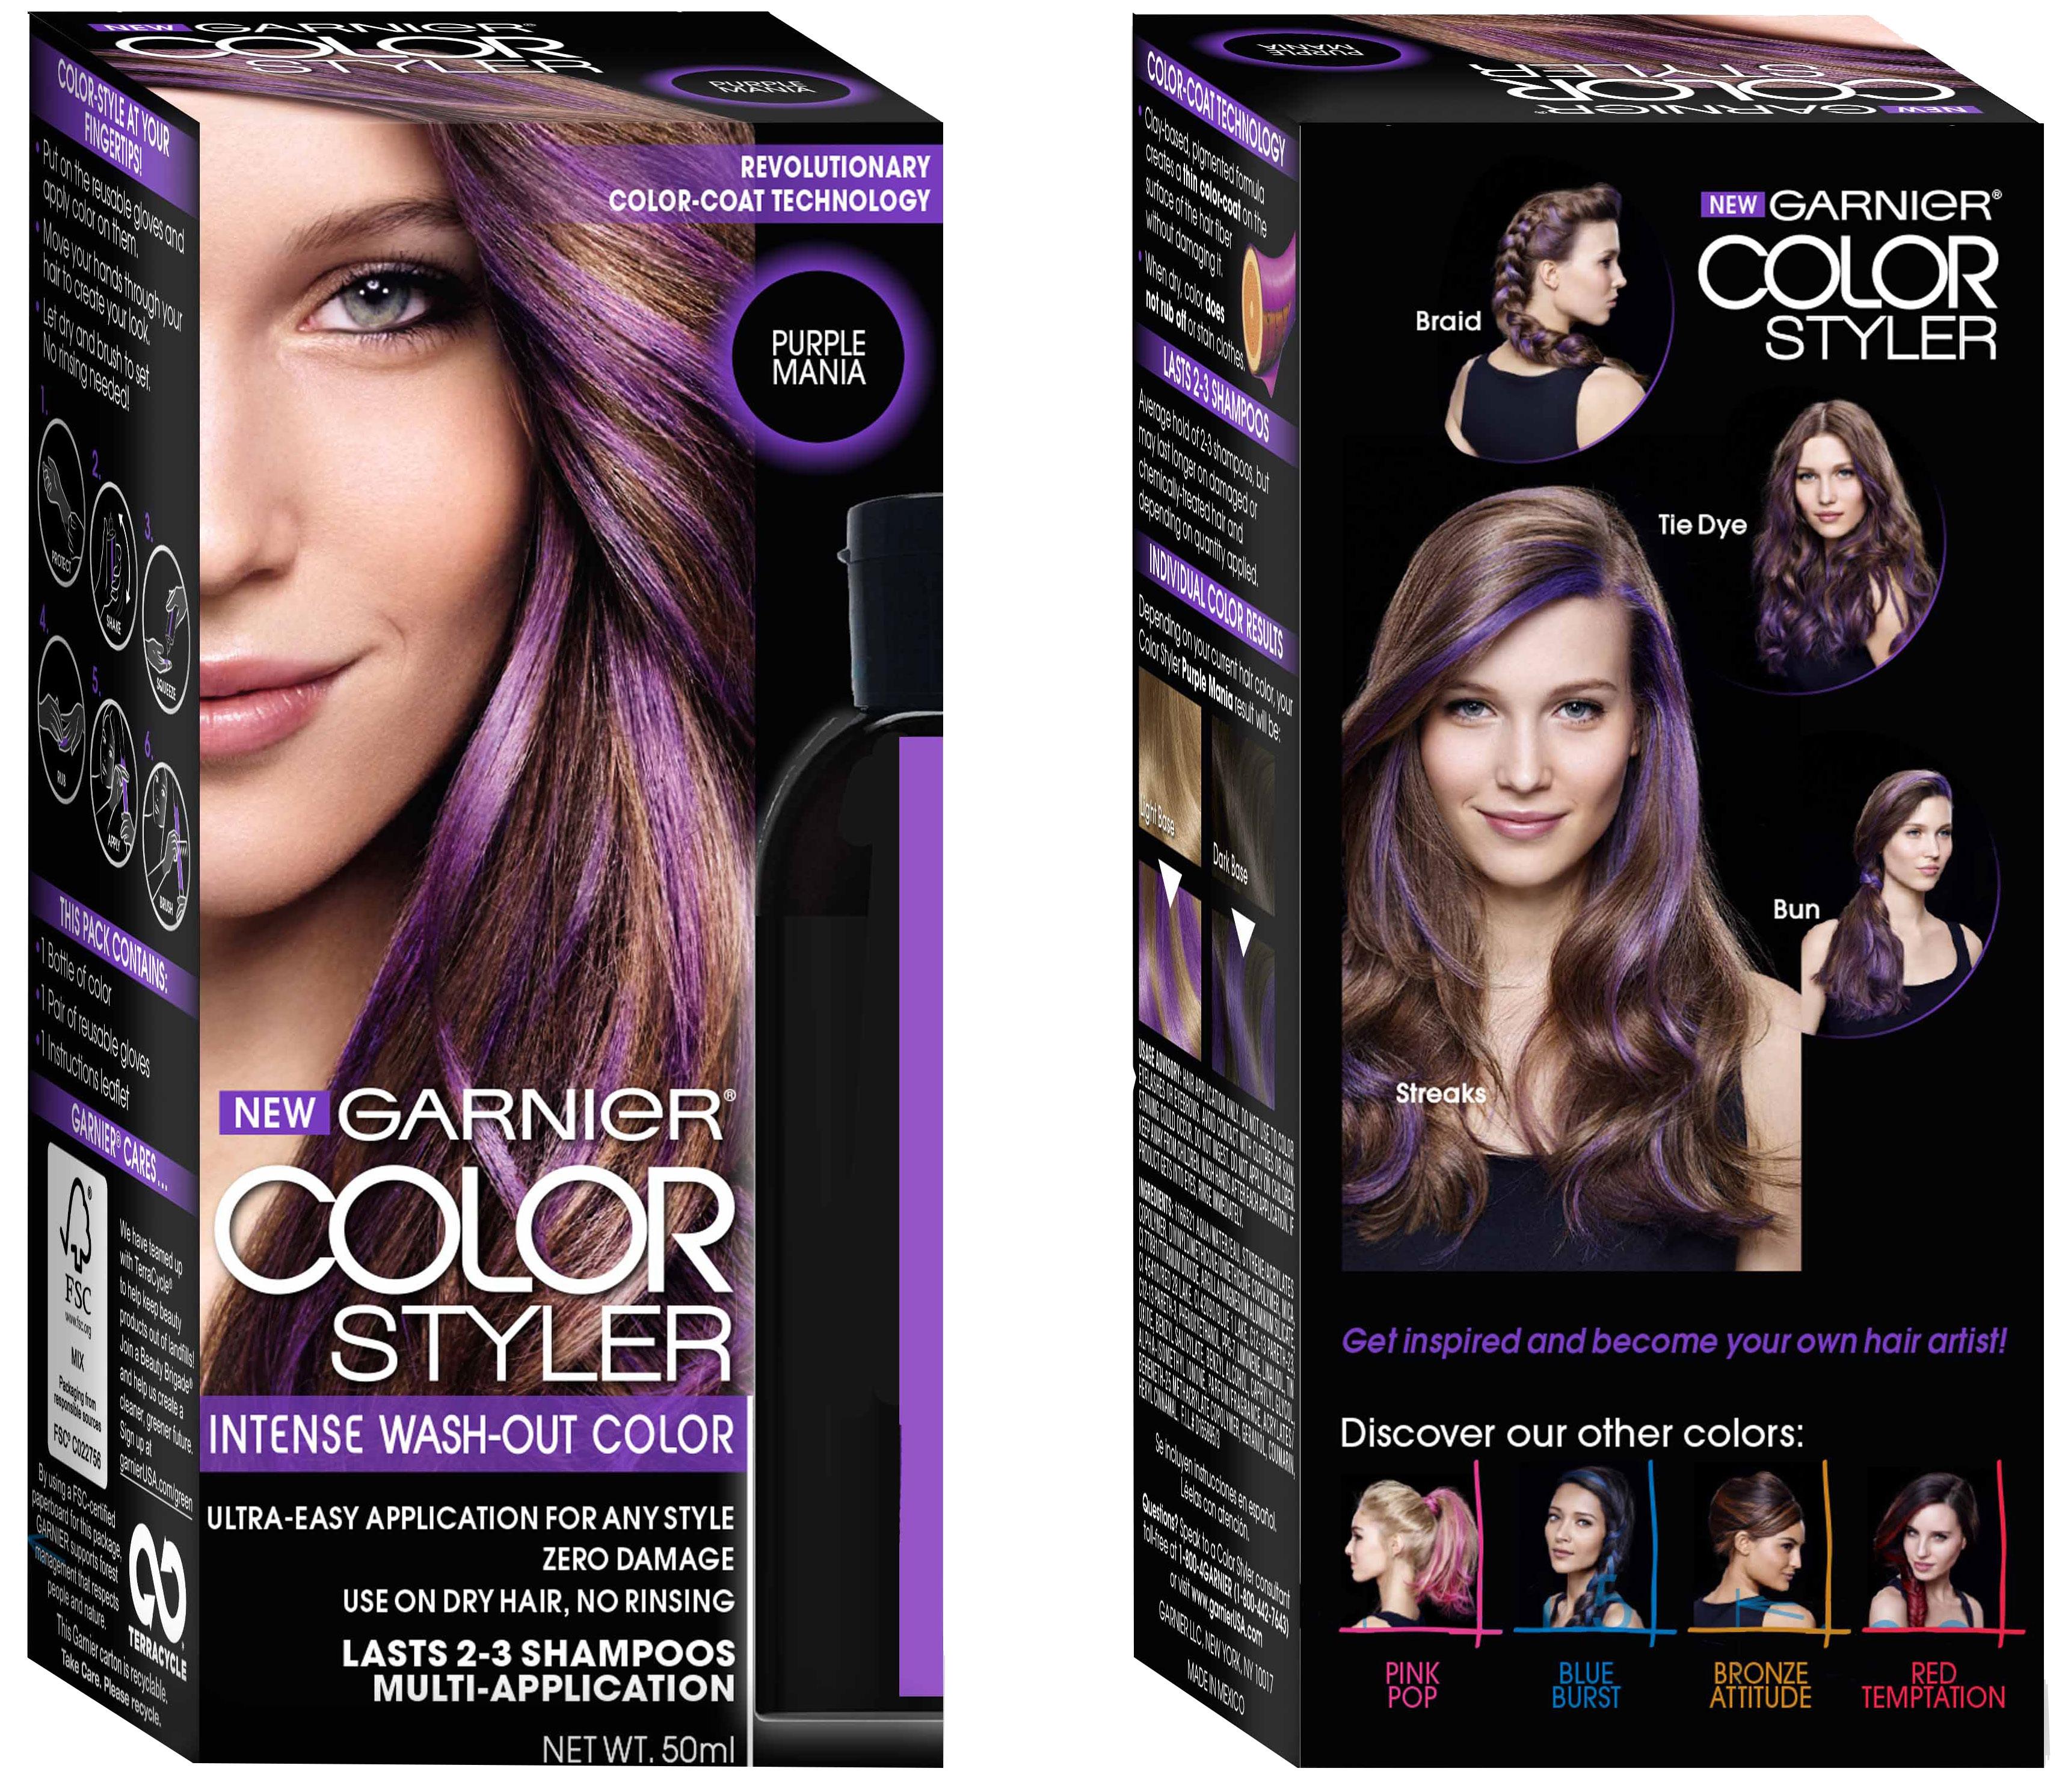 Garnier Color Styler Intense Wash-Out Color | London Drugs